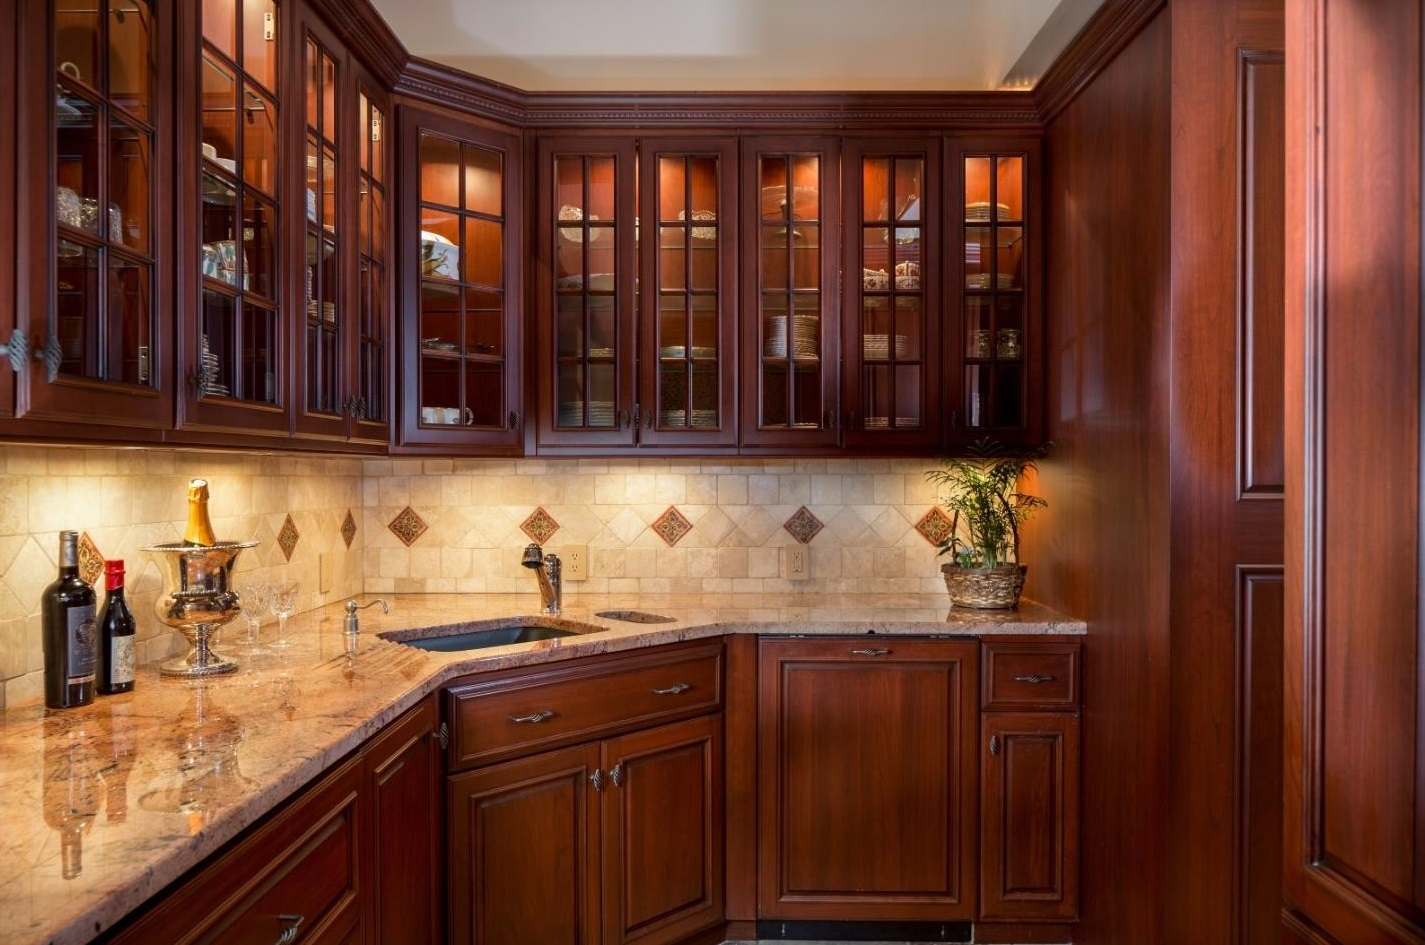 Butlers Pantry Princeton NJ | Princeton At Home | Steve Walny Realtor